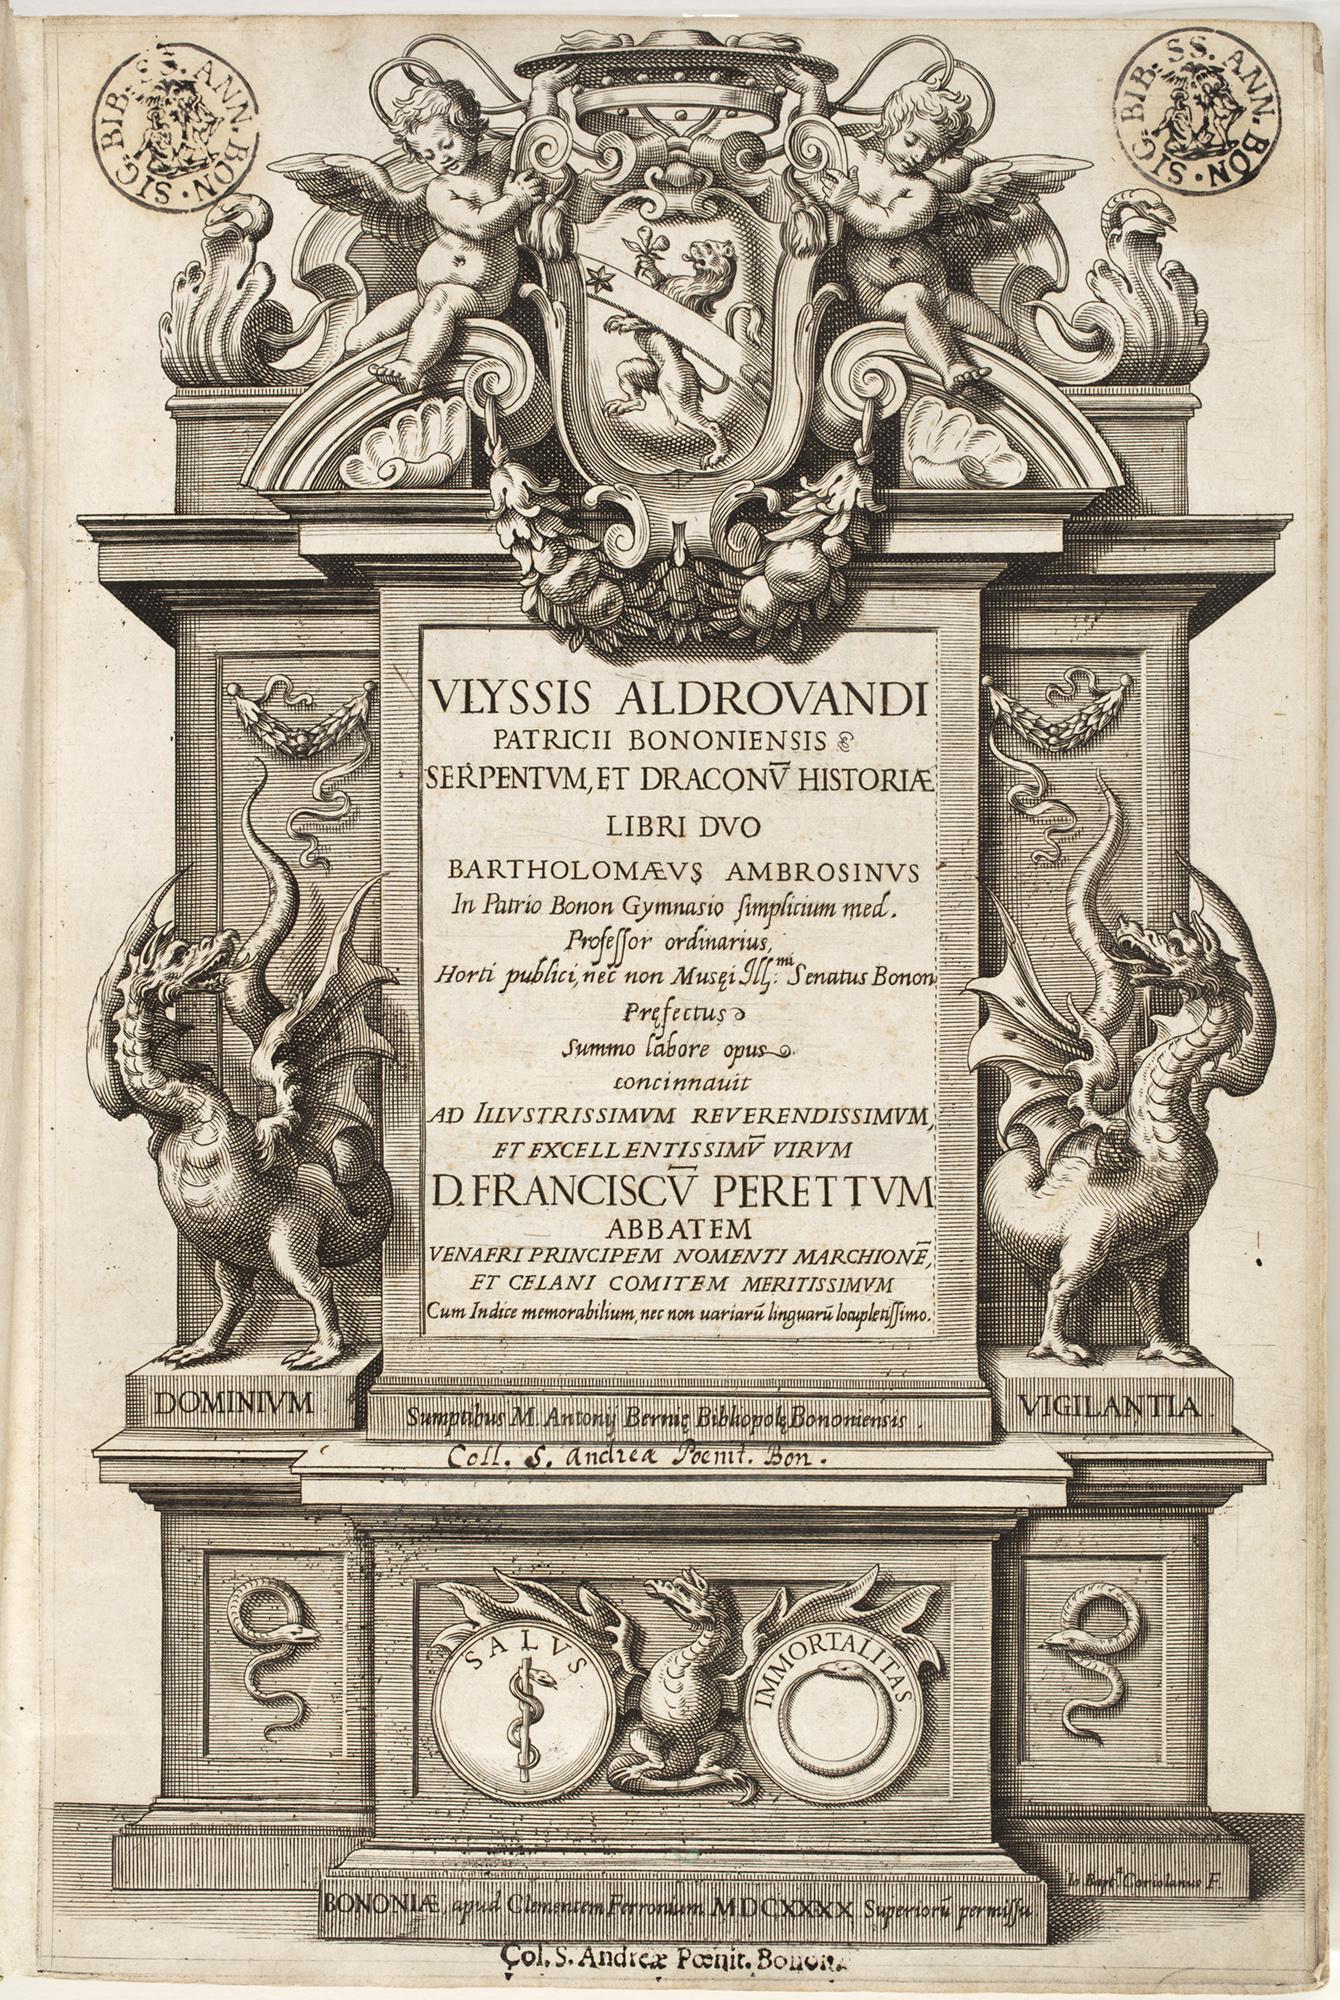 Vlyssis Aldrovandi patricii Bononiensis Serpentum, et draconu[m] historiae libri duo, 1640, by Vlyssis Aldrovandi